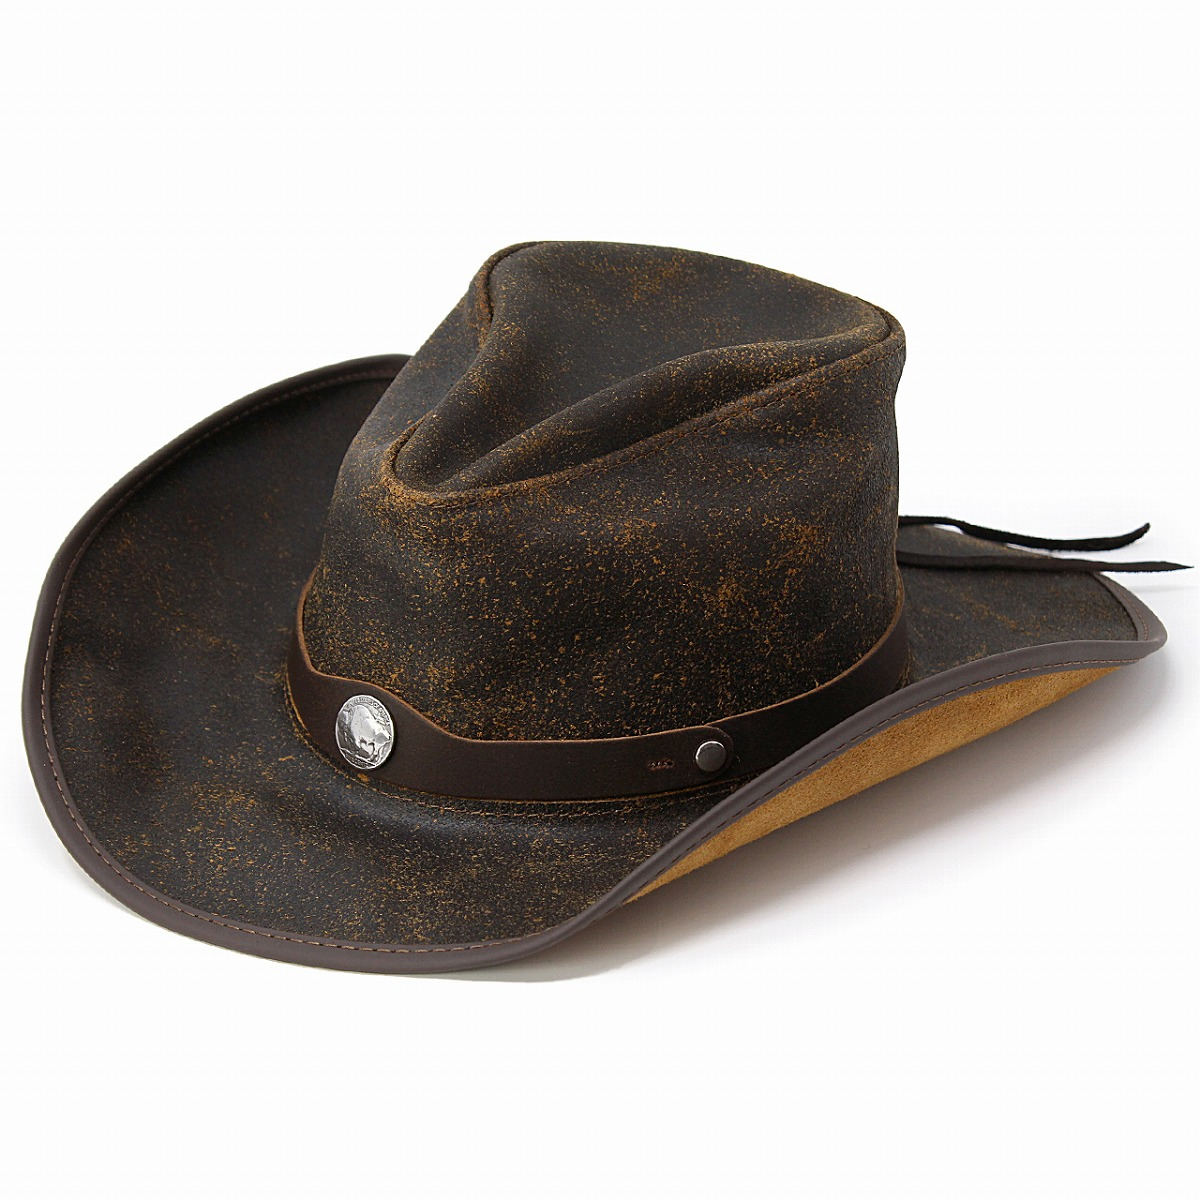 ... The lady s gentleman hat dark brown walnut  cowboy hat  man hat present  Christmas gift ... 4e215b6658d